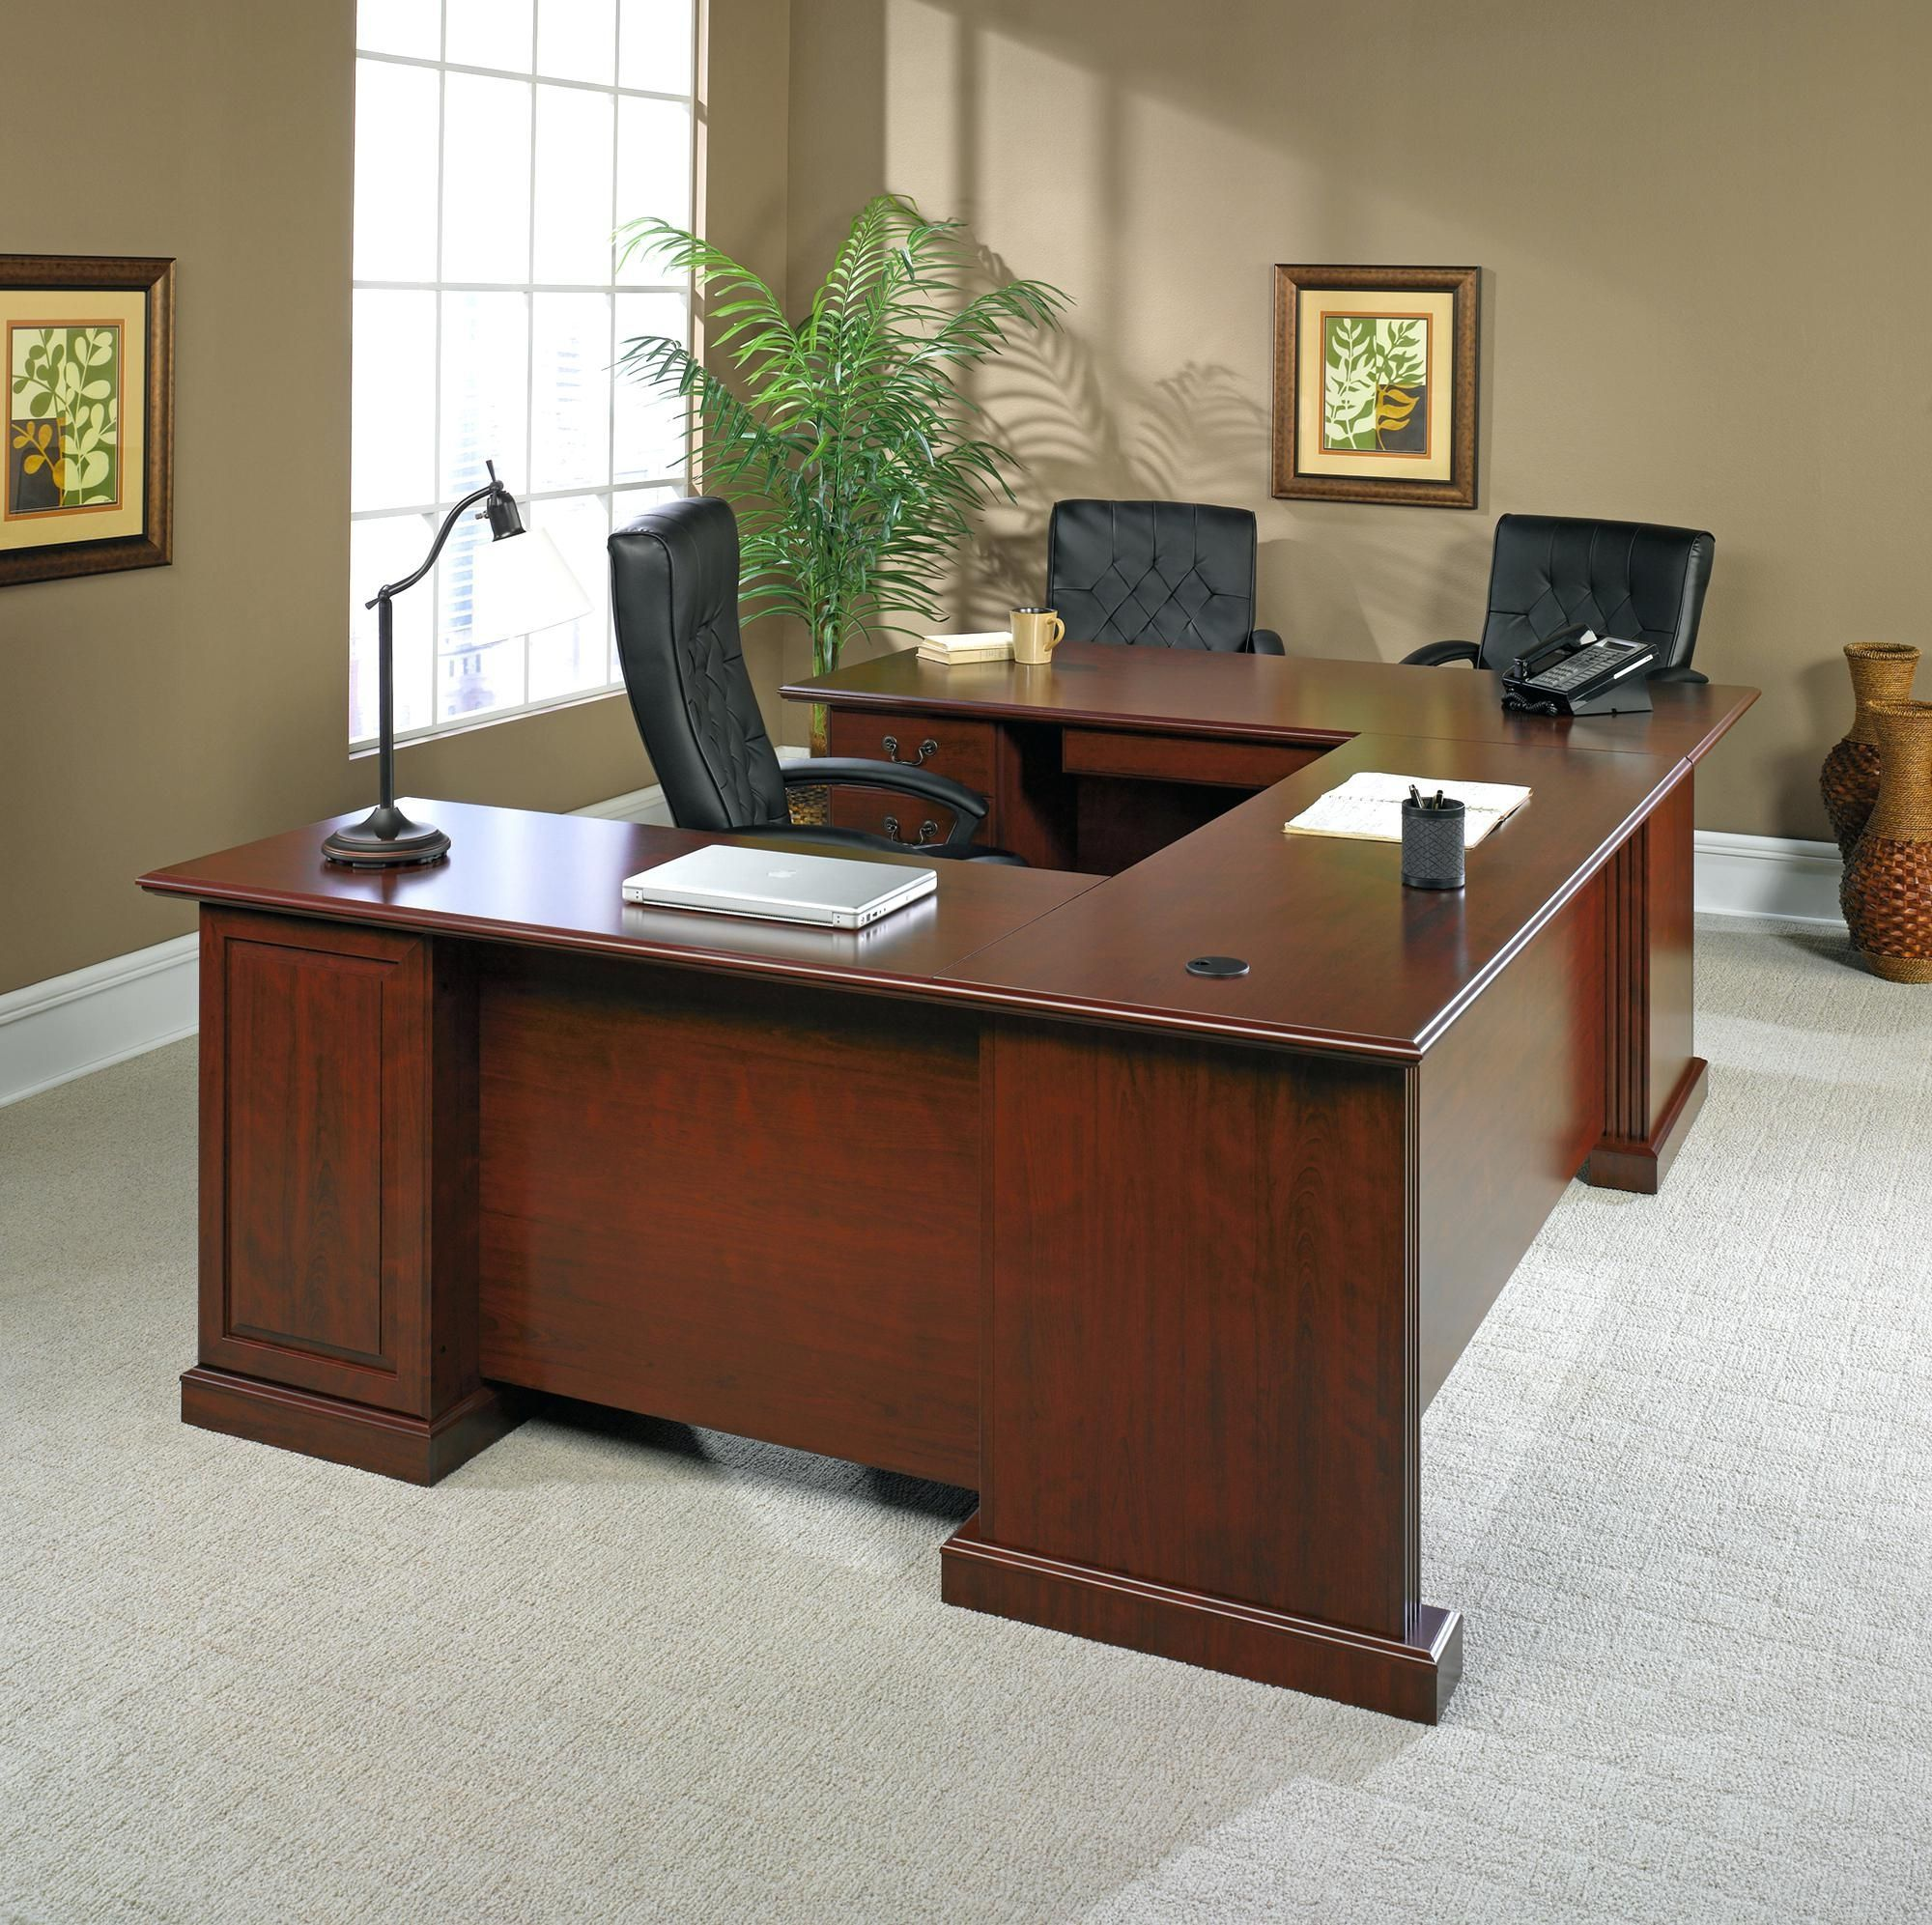 Executive Desks Office Depot Professionalofficedesigns Home